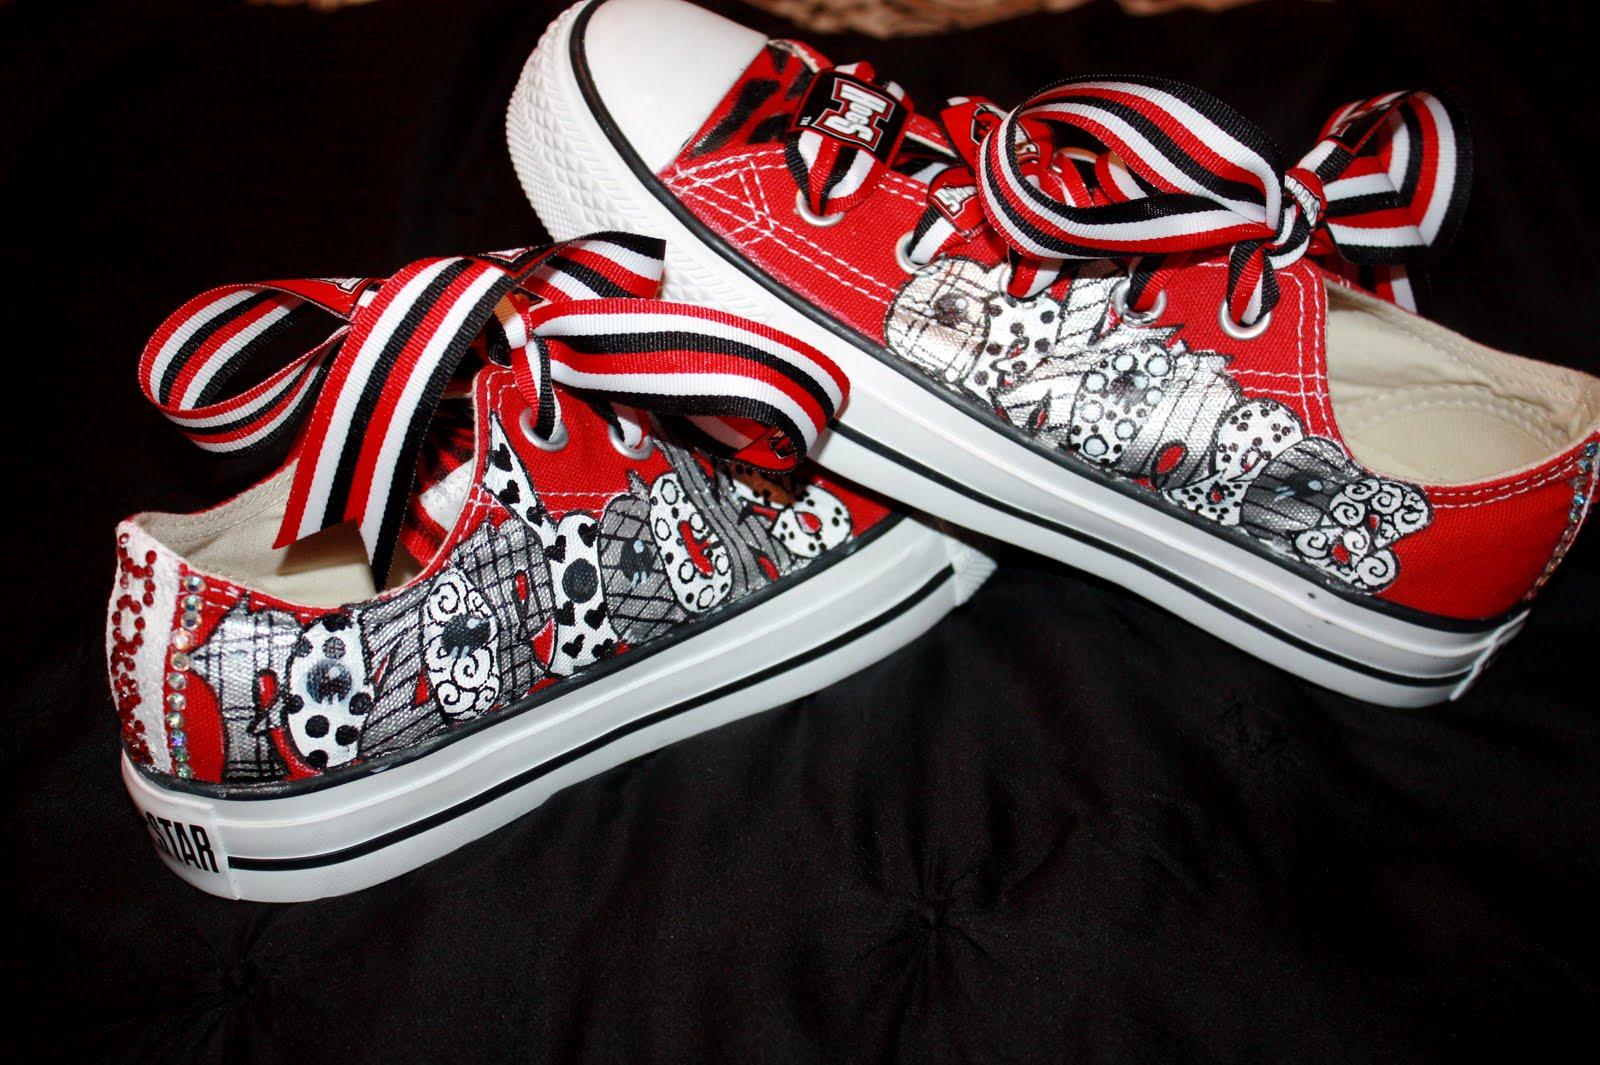 Arkansas Razorback Converse Shoes